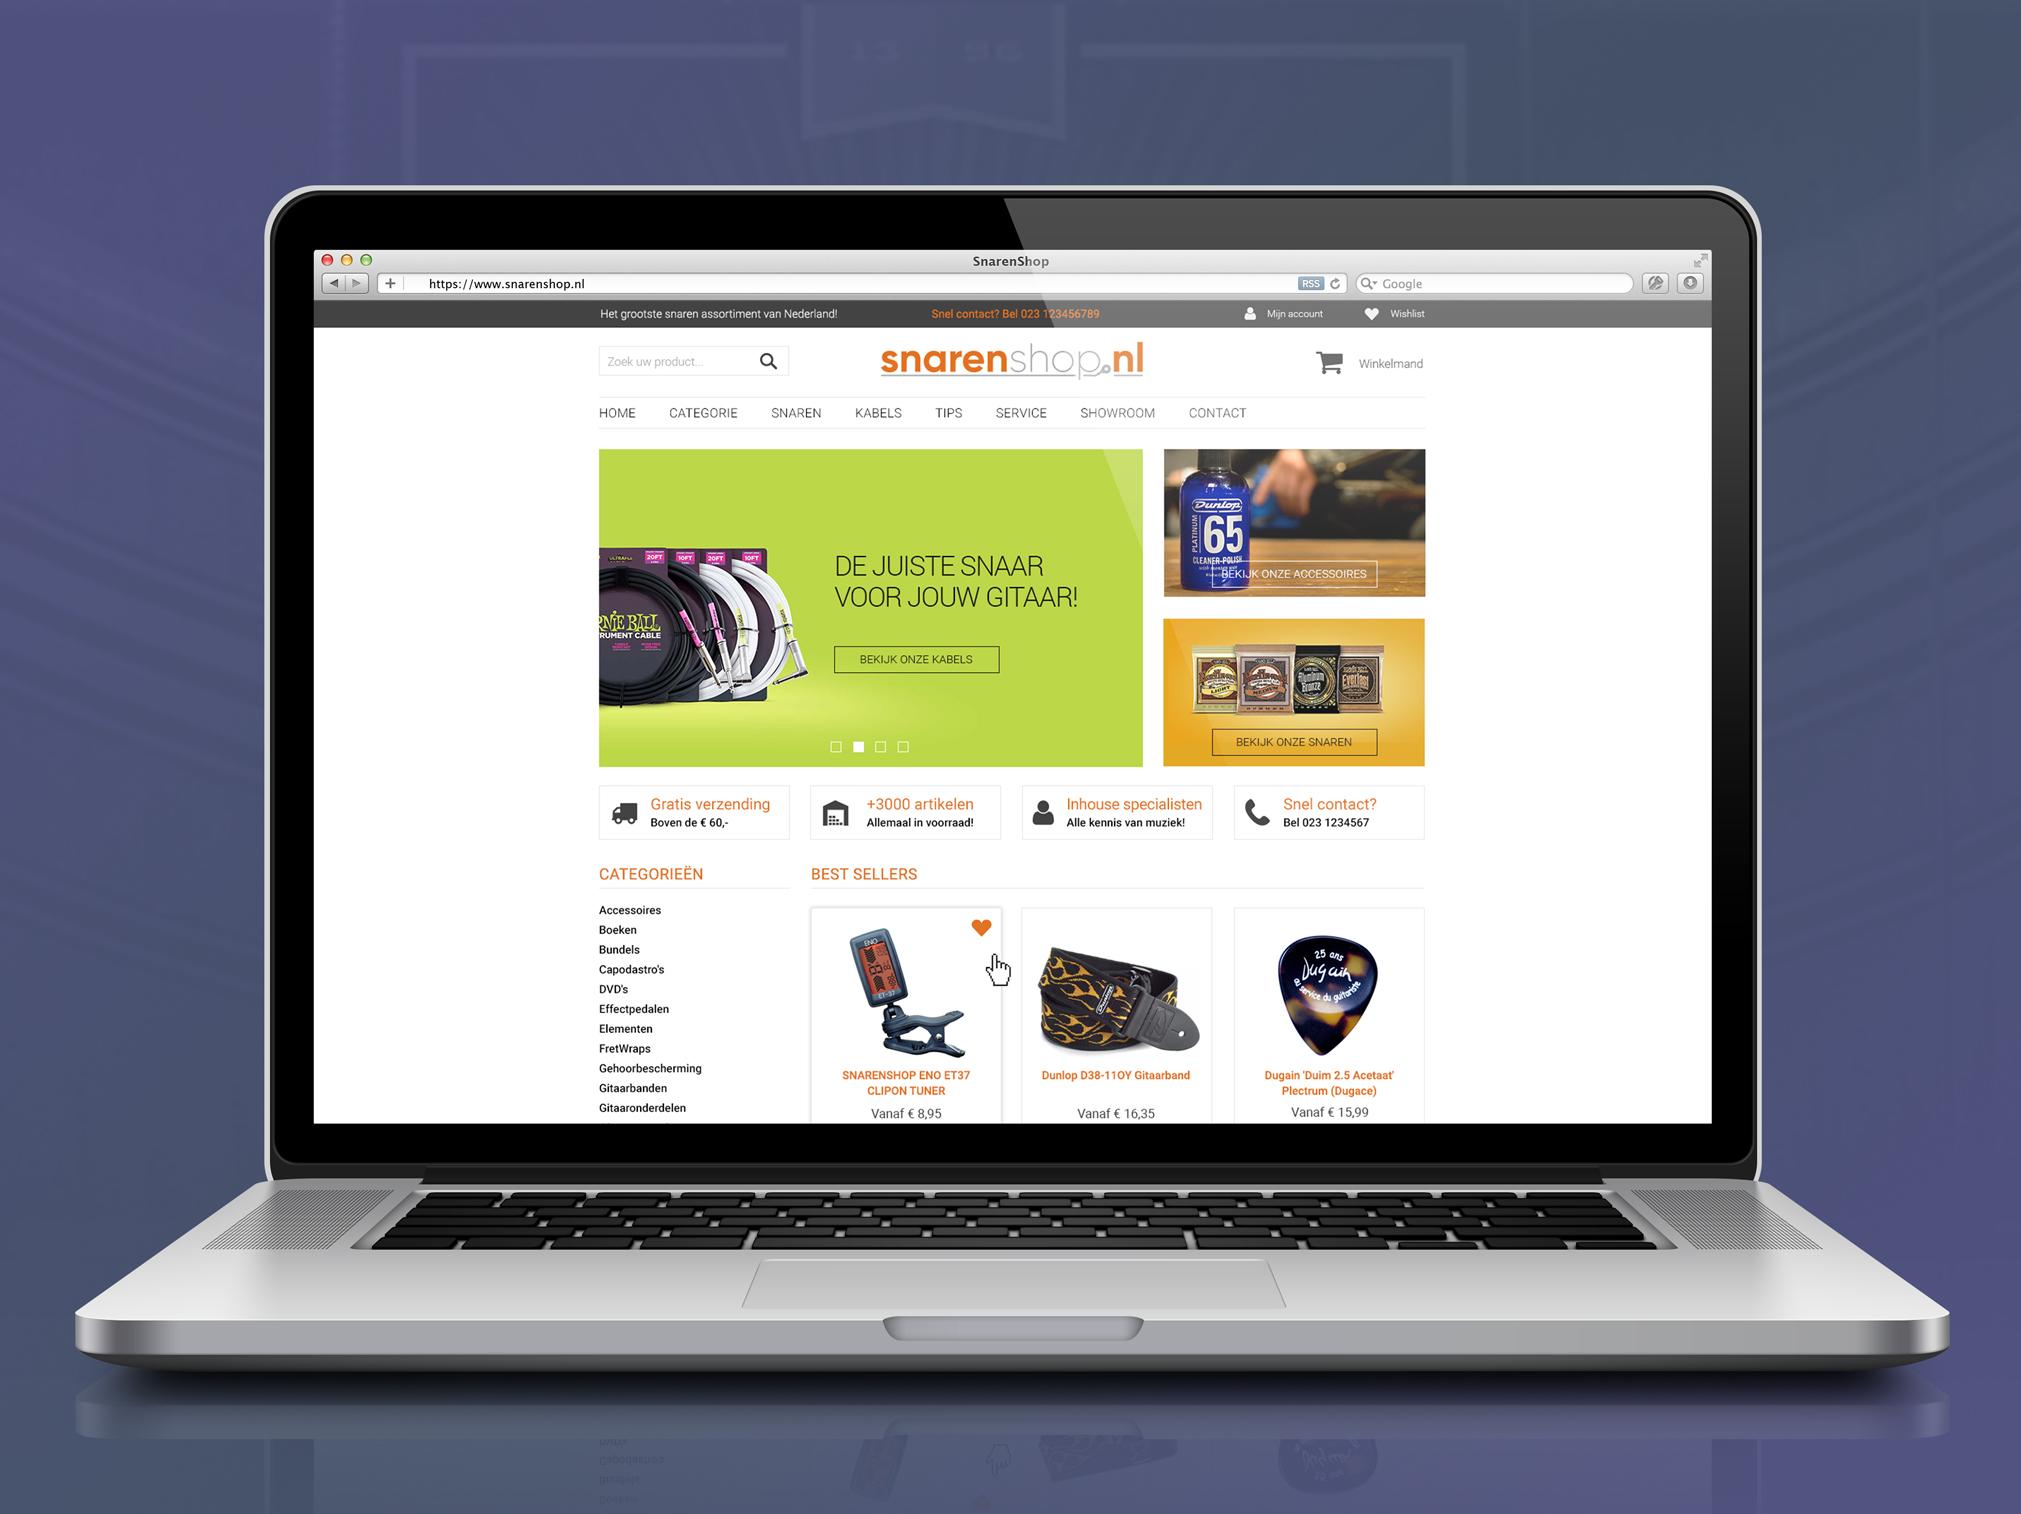 webdesign-woocommerce-wordpress-responsive-snarenshop-